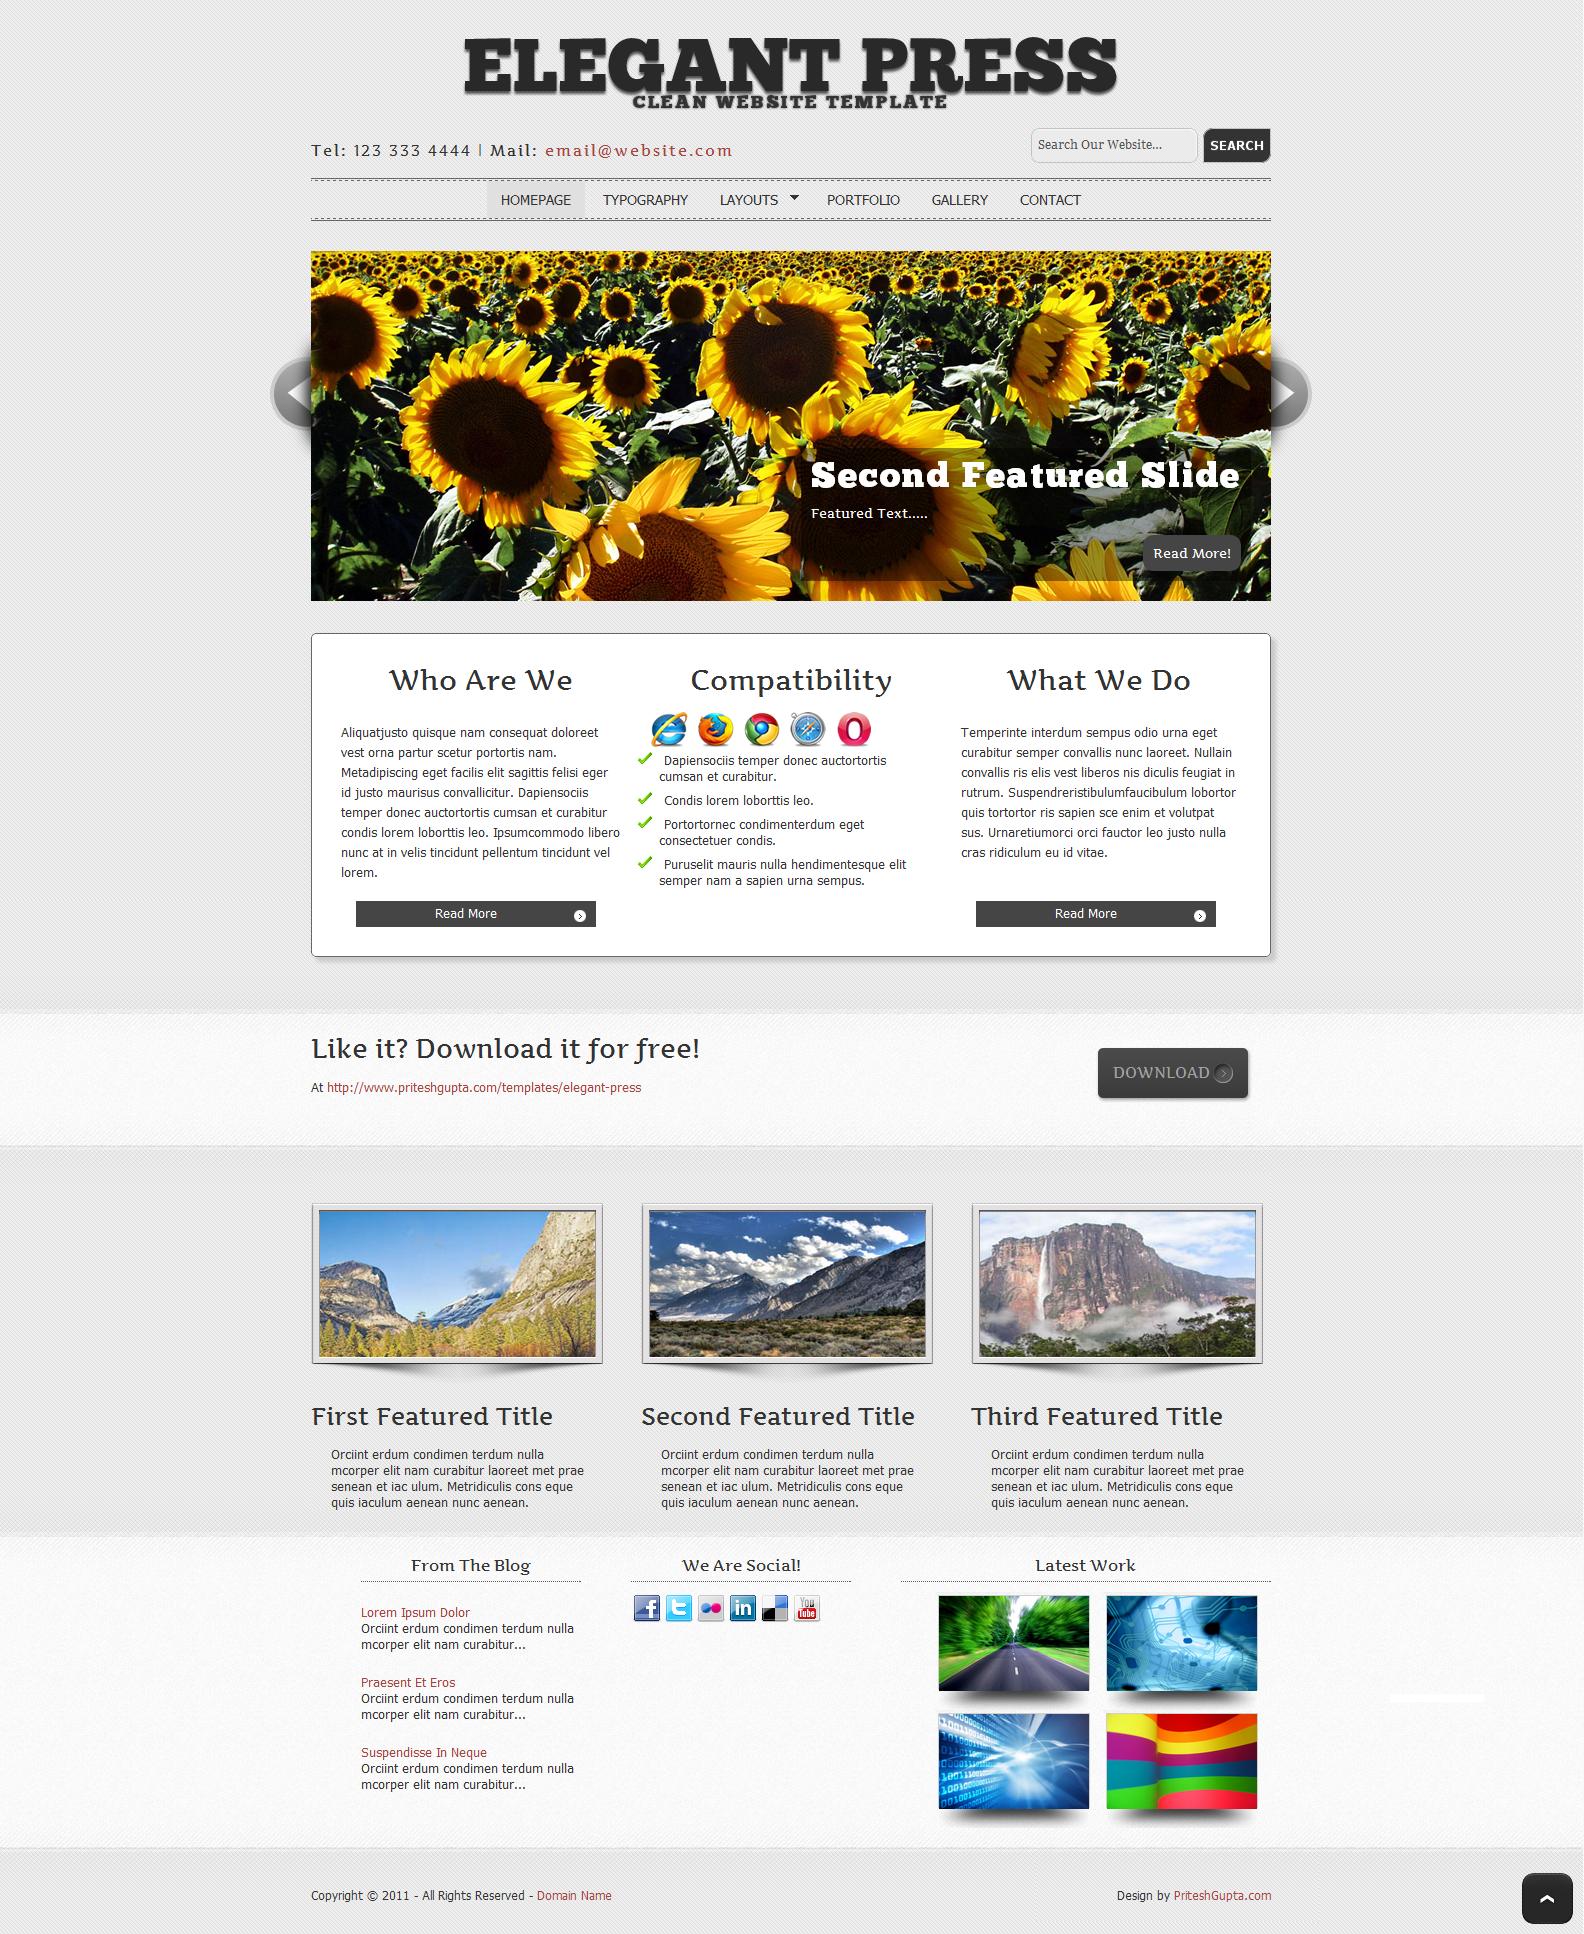 Elegant Press: Free Website Template | Pritesh Gupta